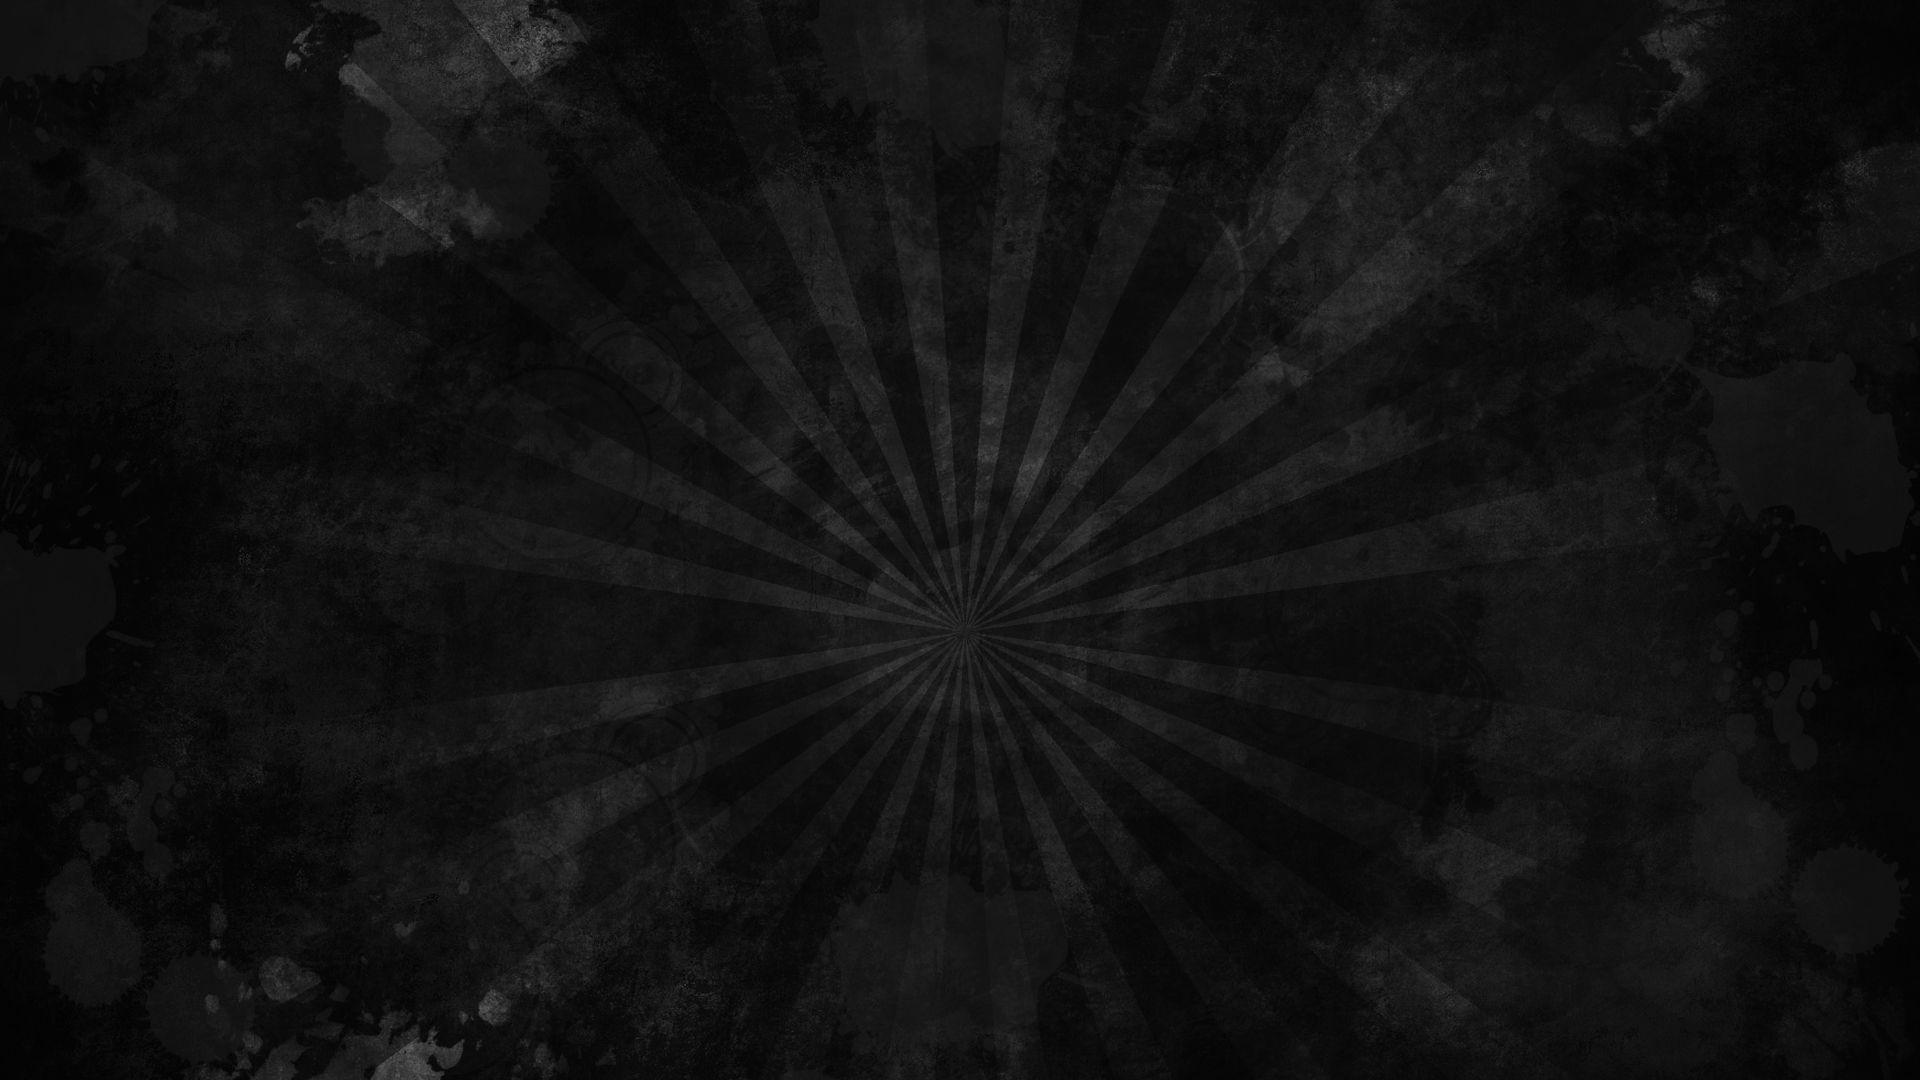 Black Aesthetic Desktop Wallpaper Tumblr